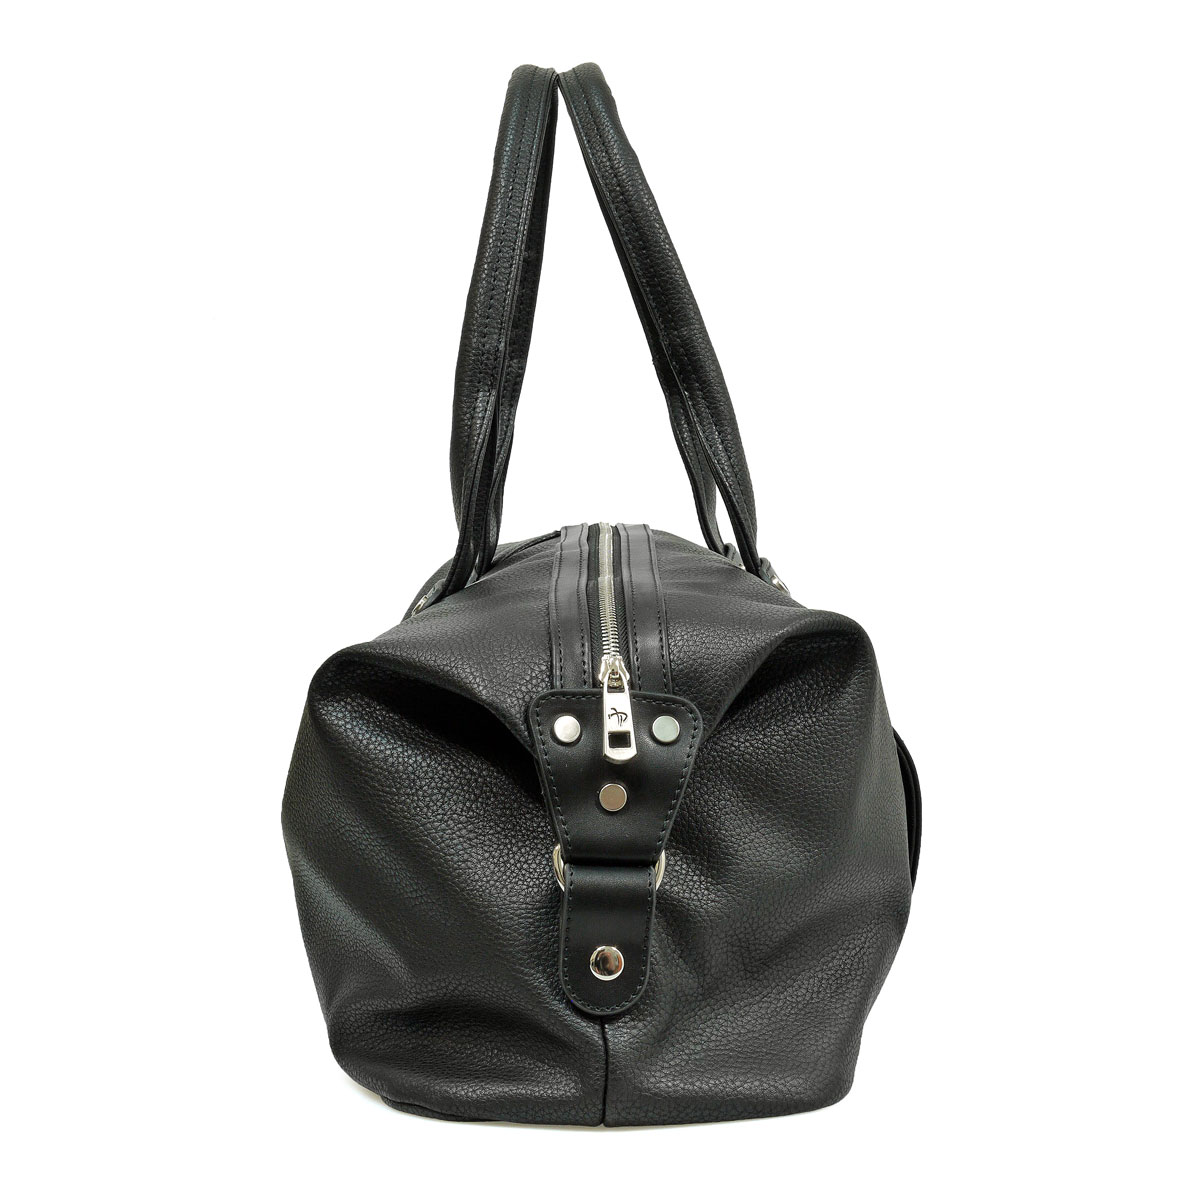 812-629-1 Bag Pellekon